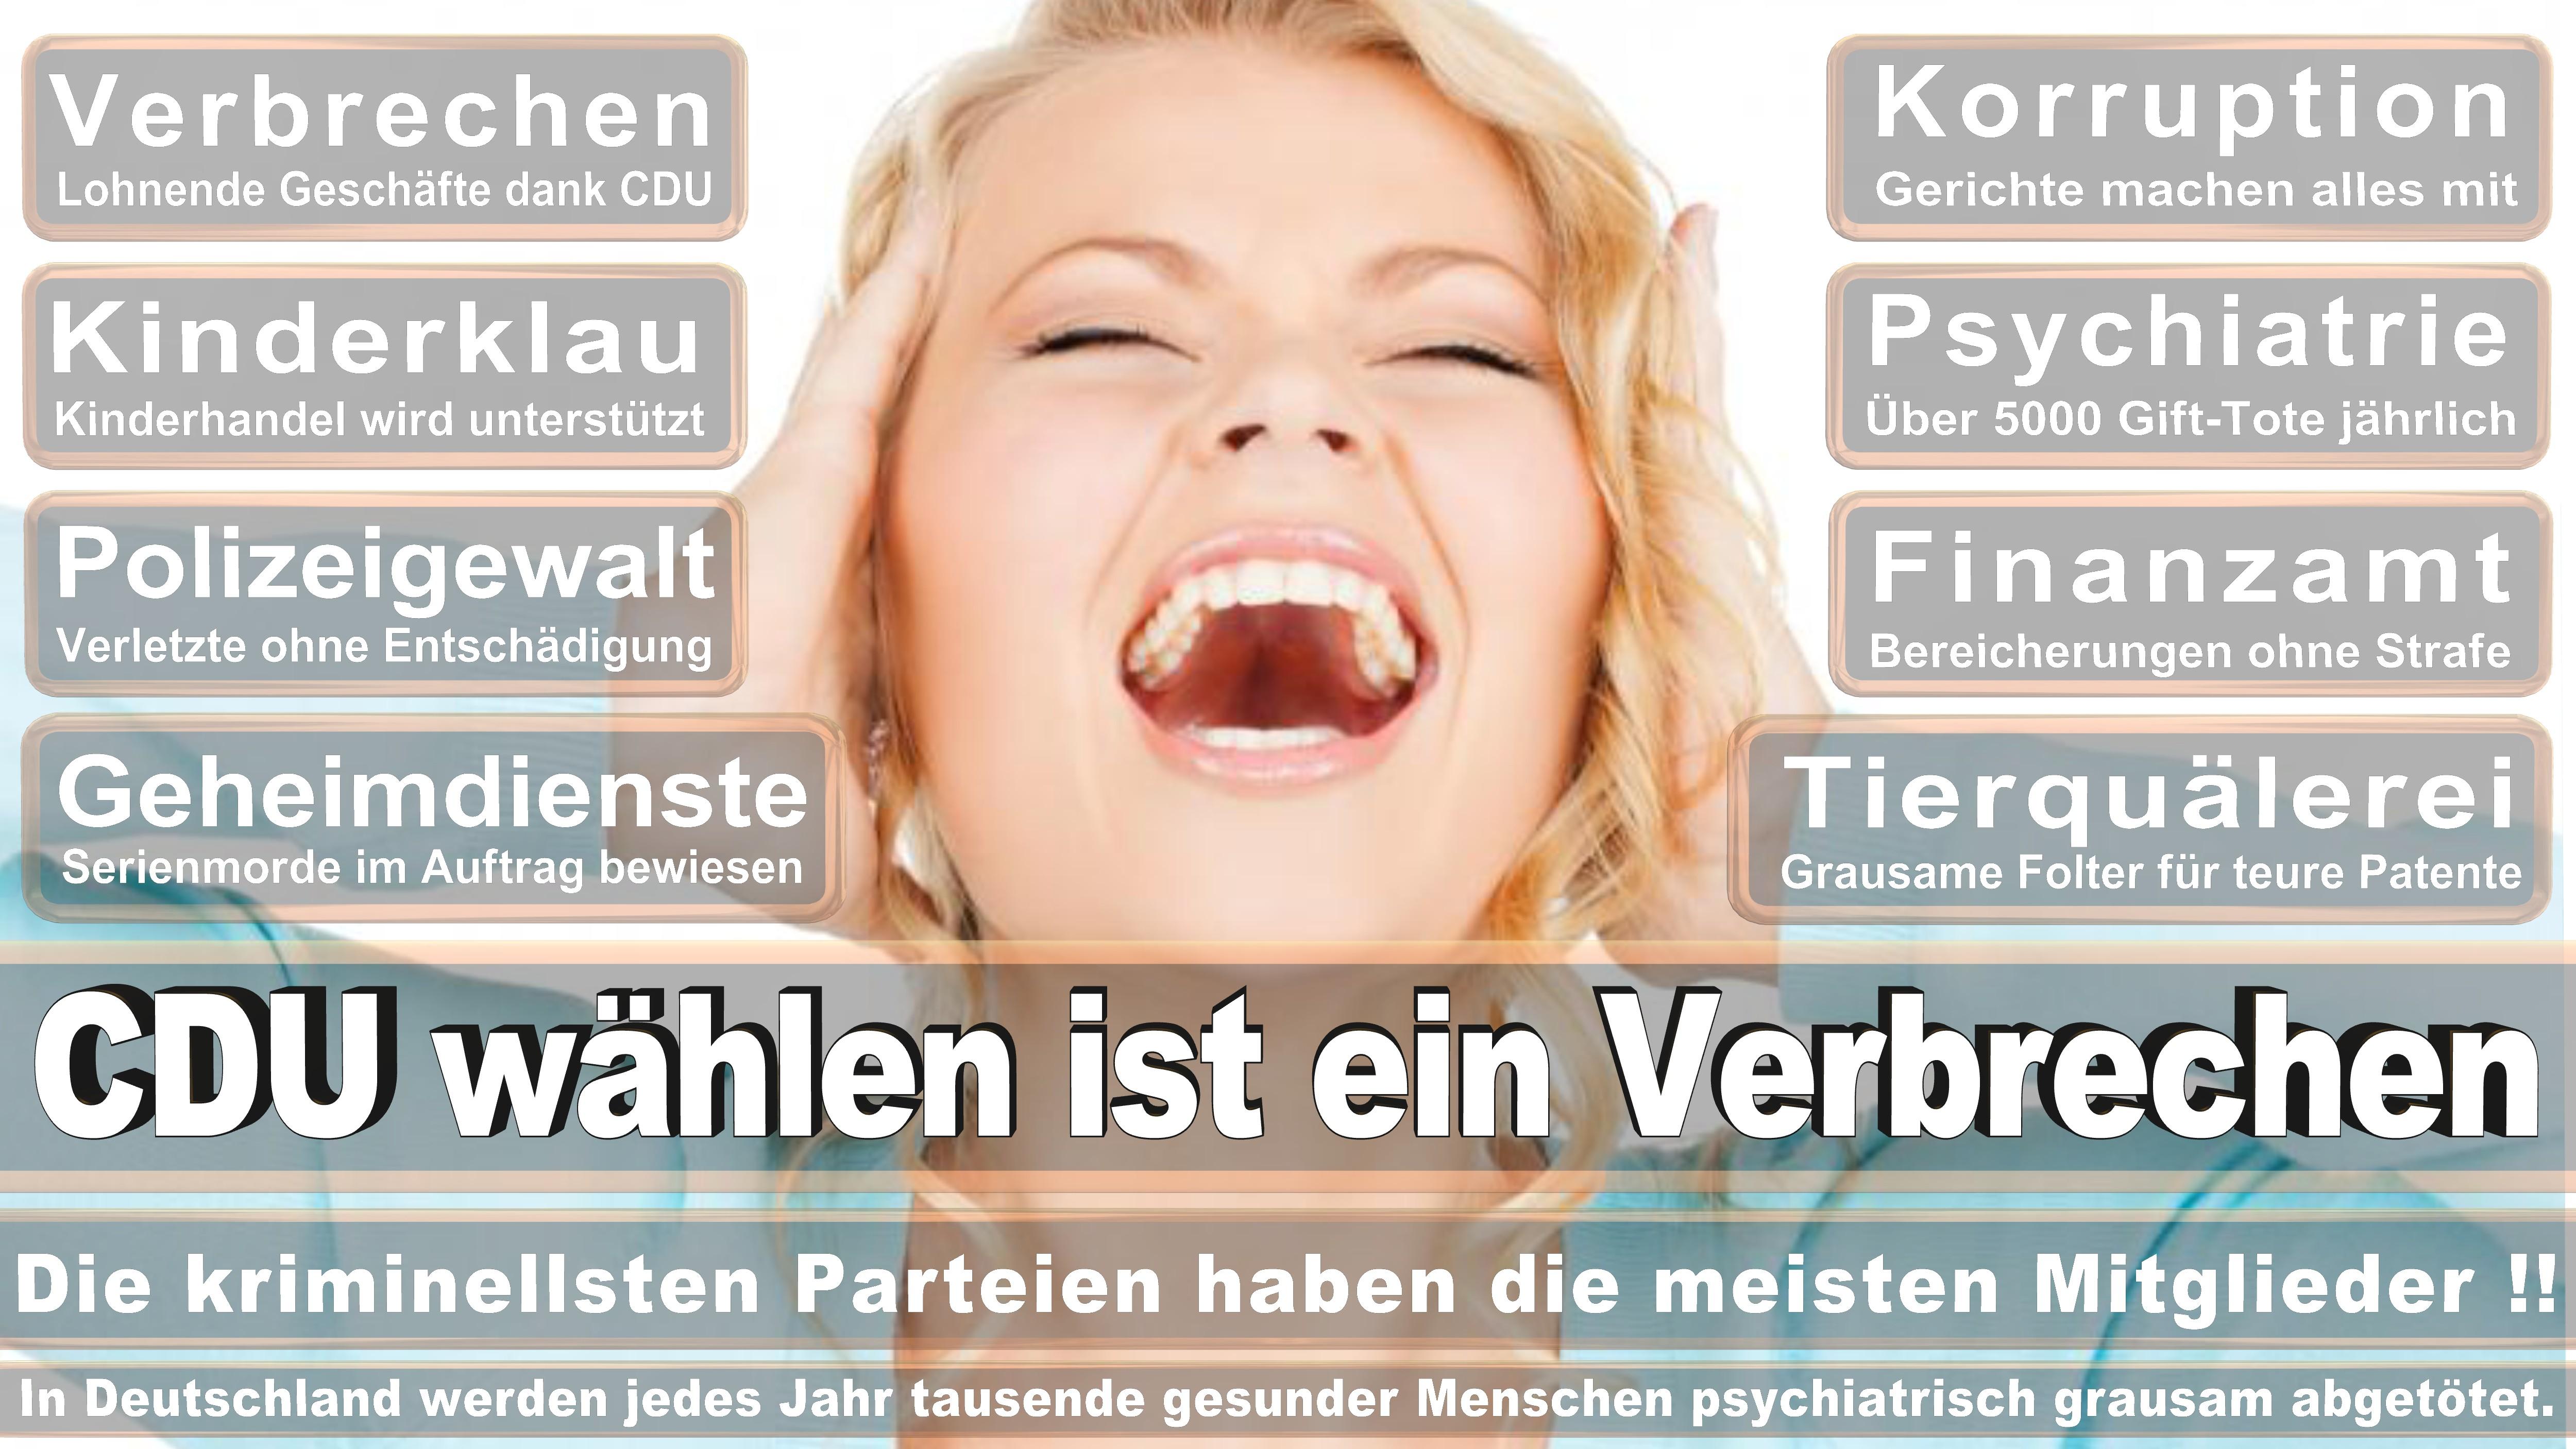 Heike Brehmer CDU CSU Politiker